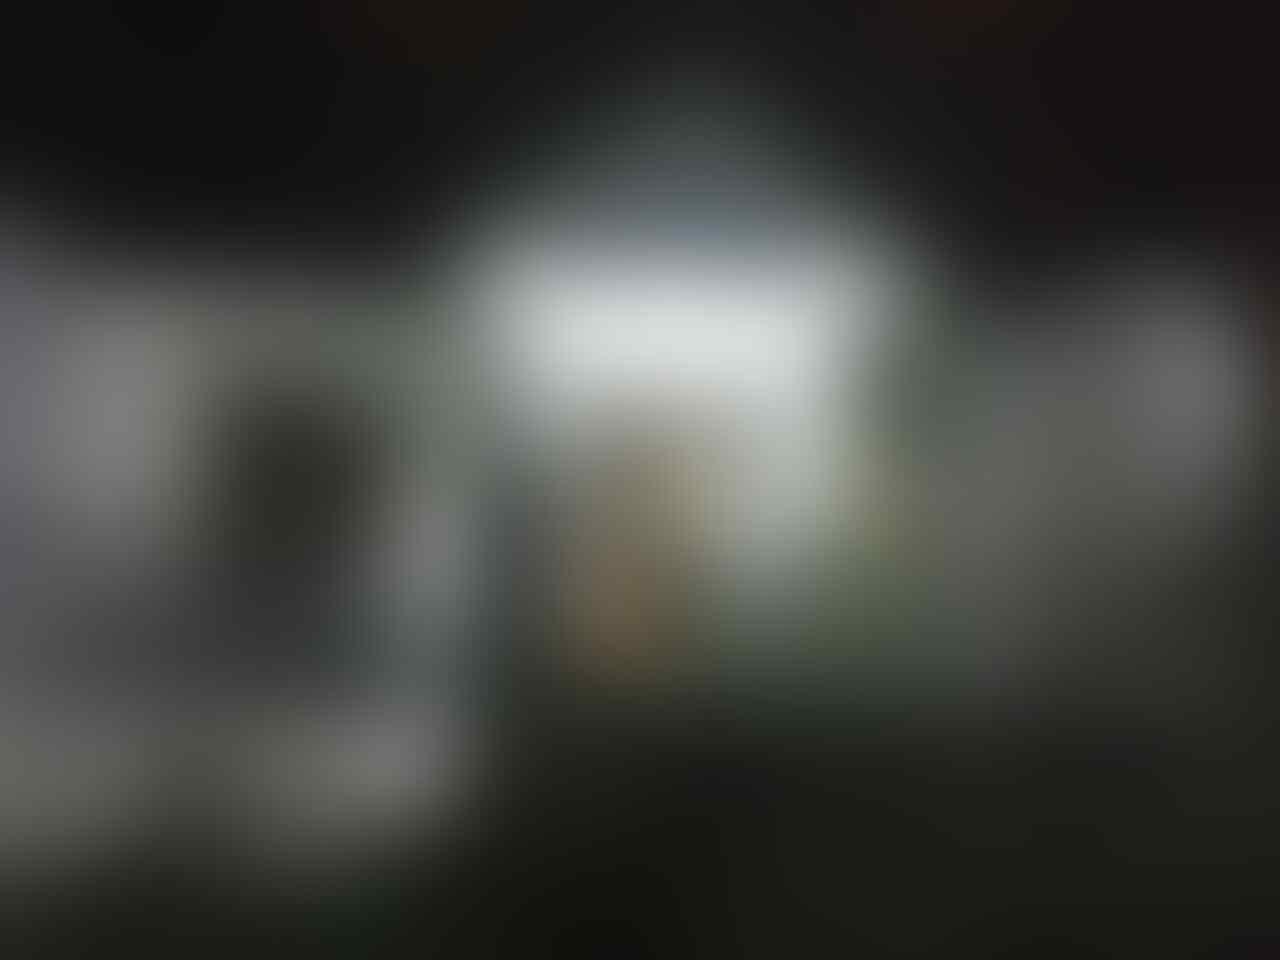 [JUAL] Rumah 22/60 Perum Bumi Kencana Permai, Tanah Sareal, Kota Bogor